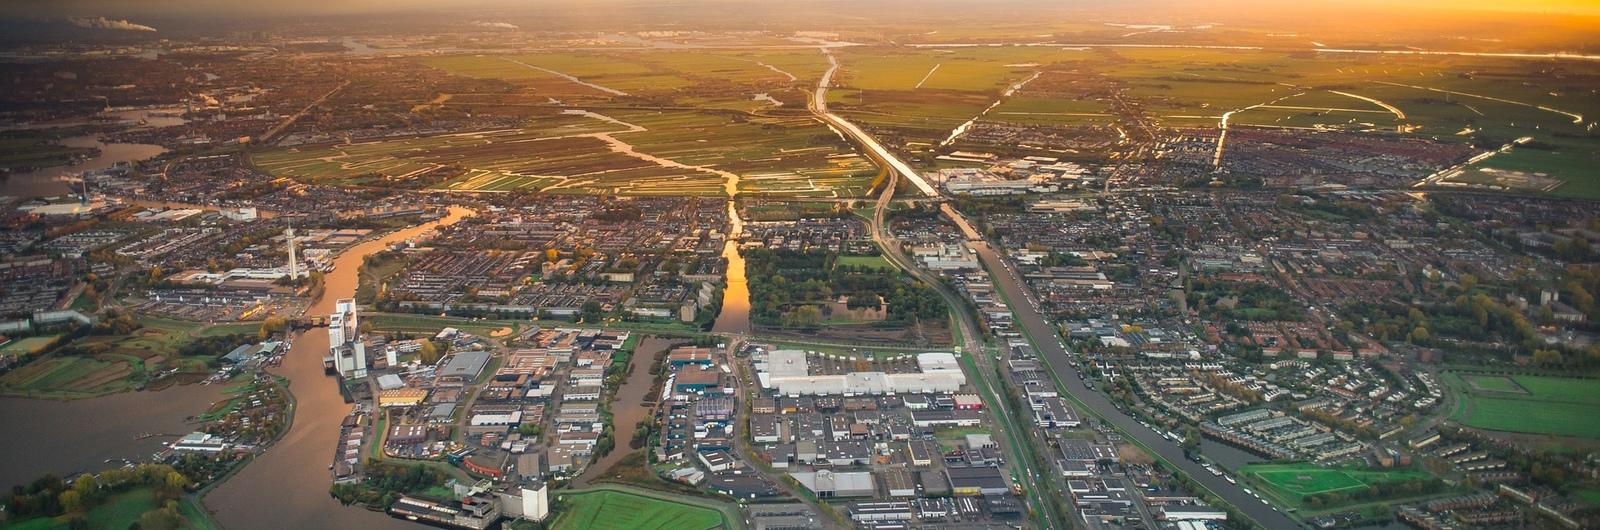 schiphol city header3